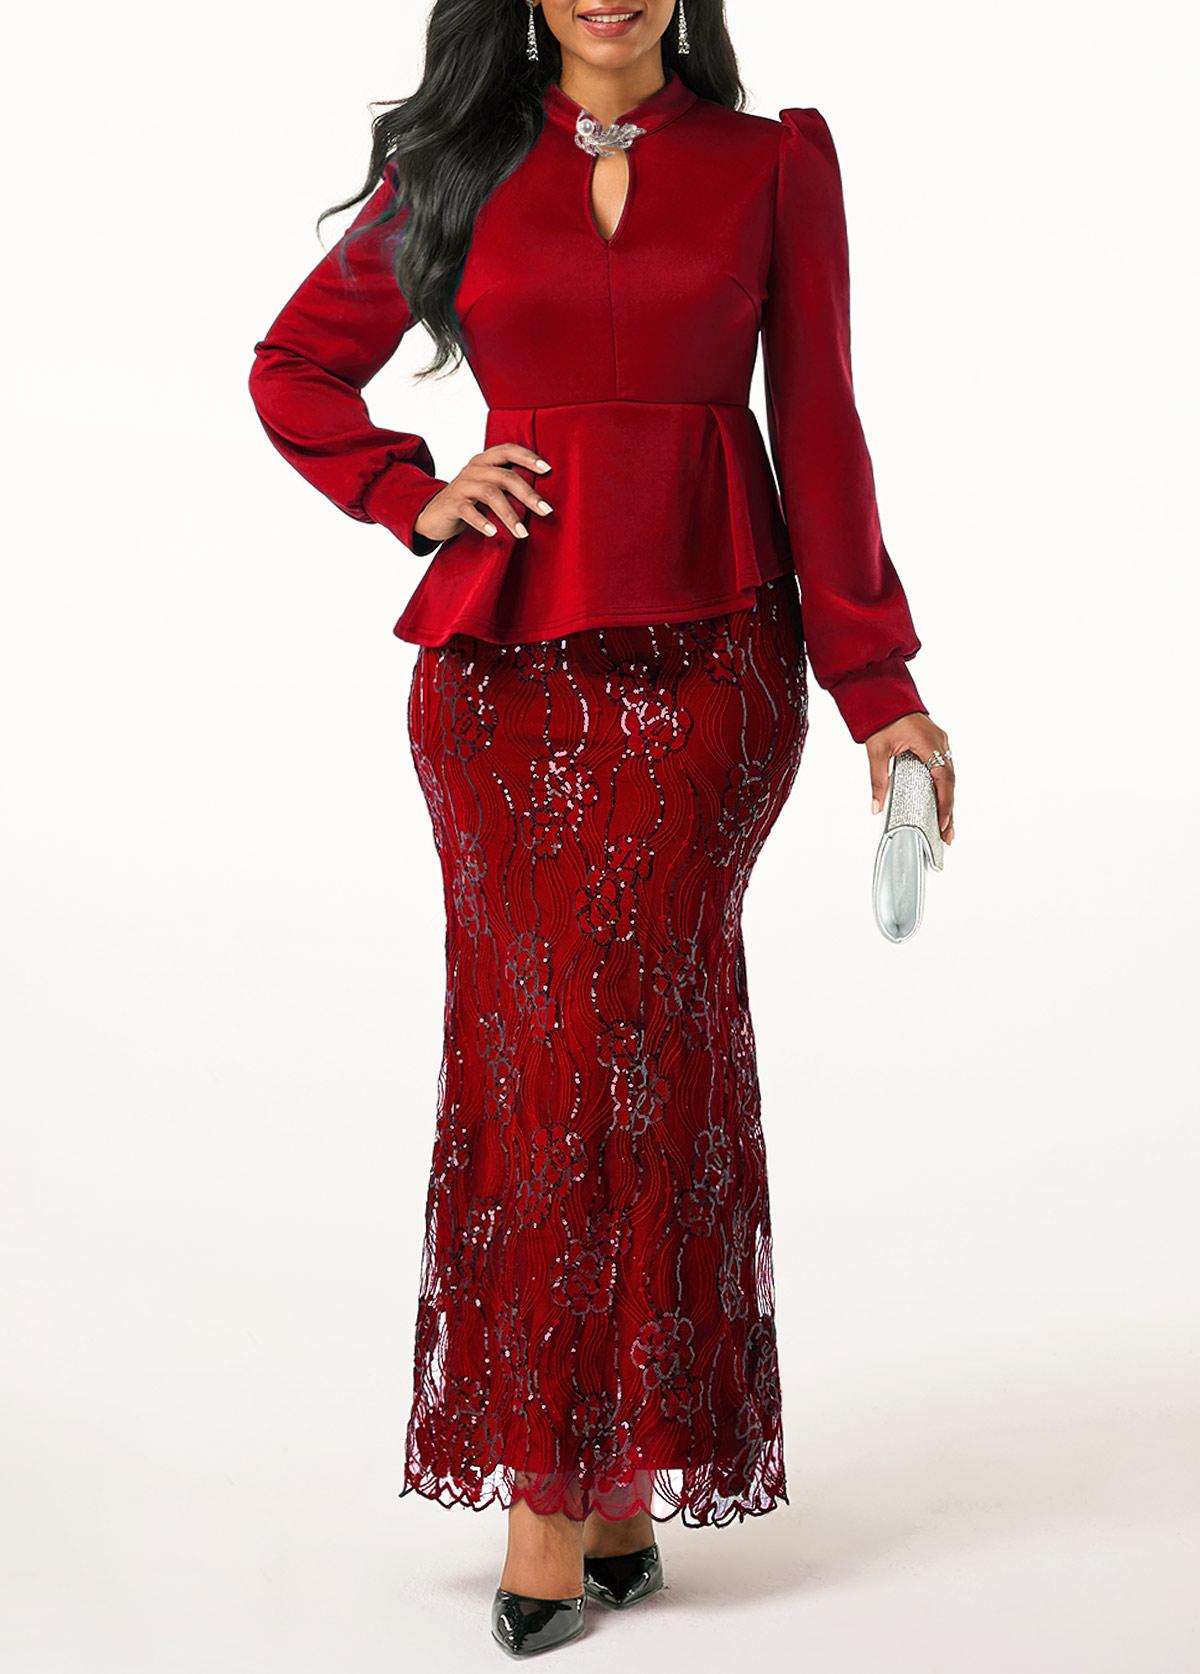 Peplum Waist Wine Red Lace Patchwork Dress